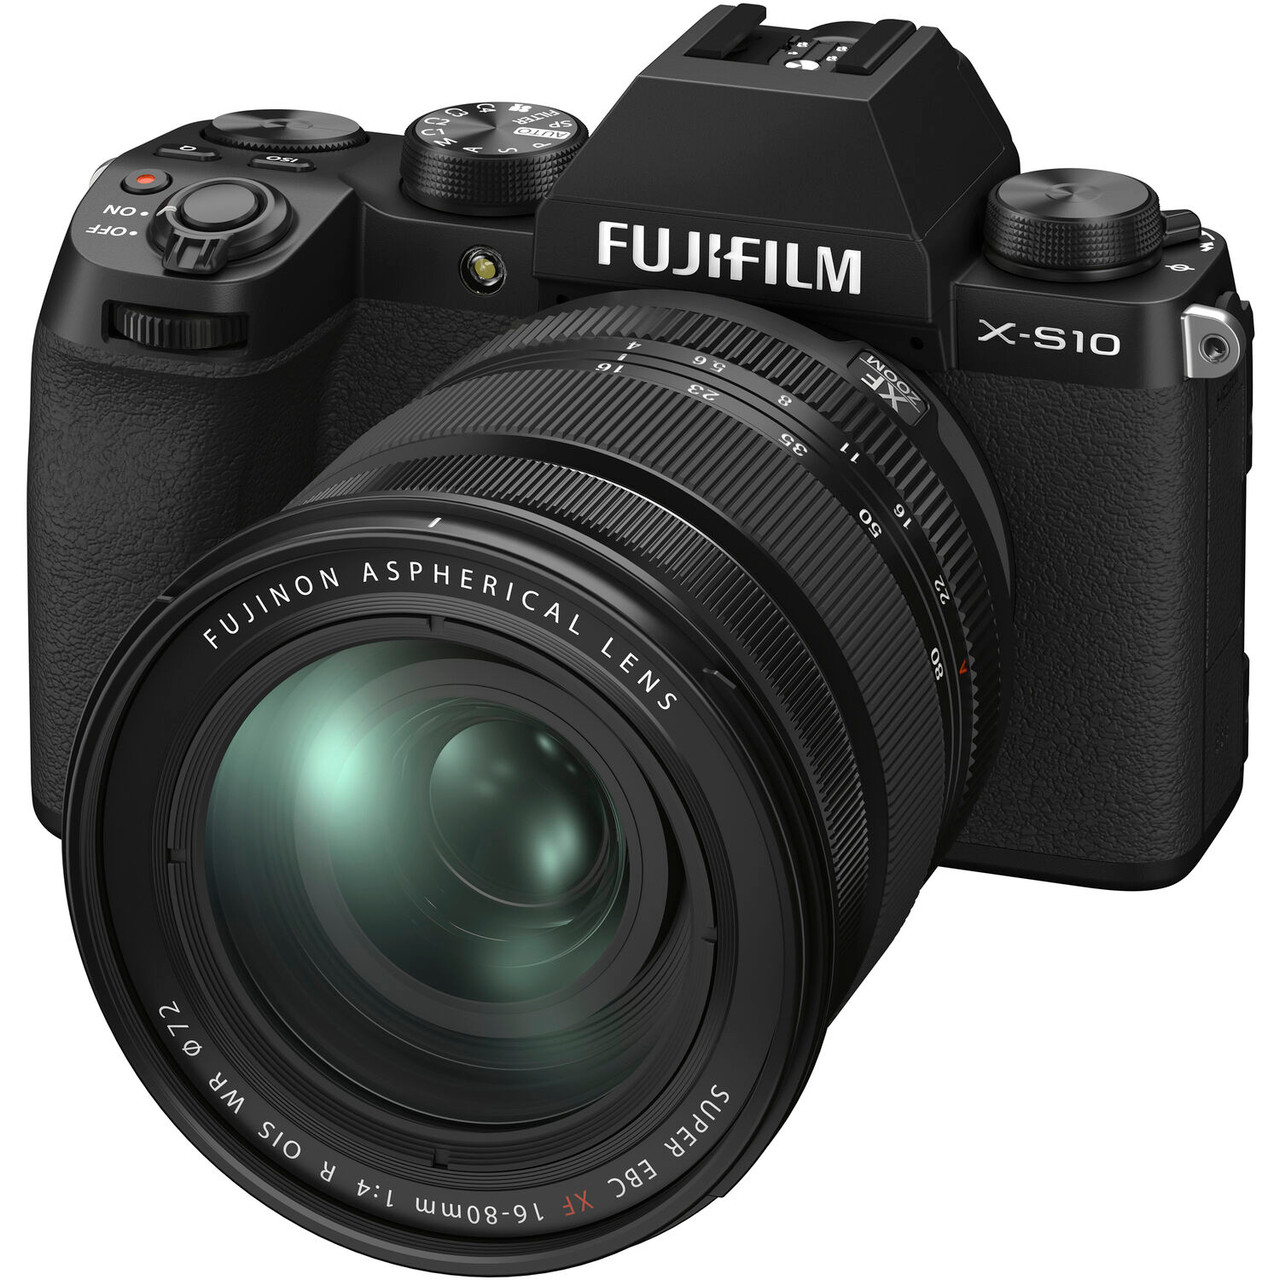 FUJIFILM X-S10 Mirrorless Digital Camera with 16-80mm Lens